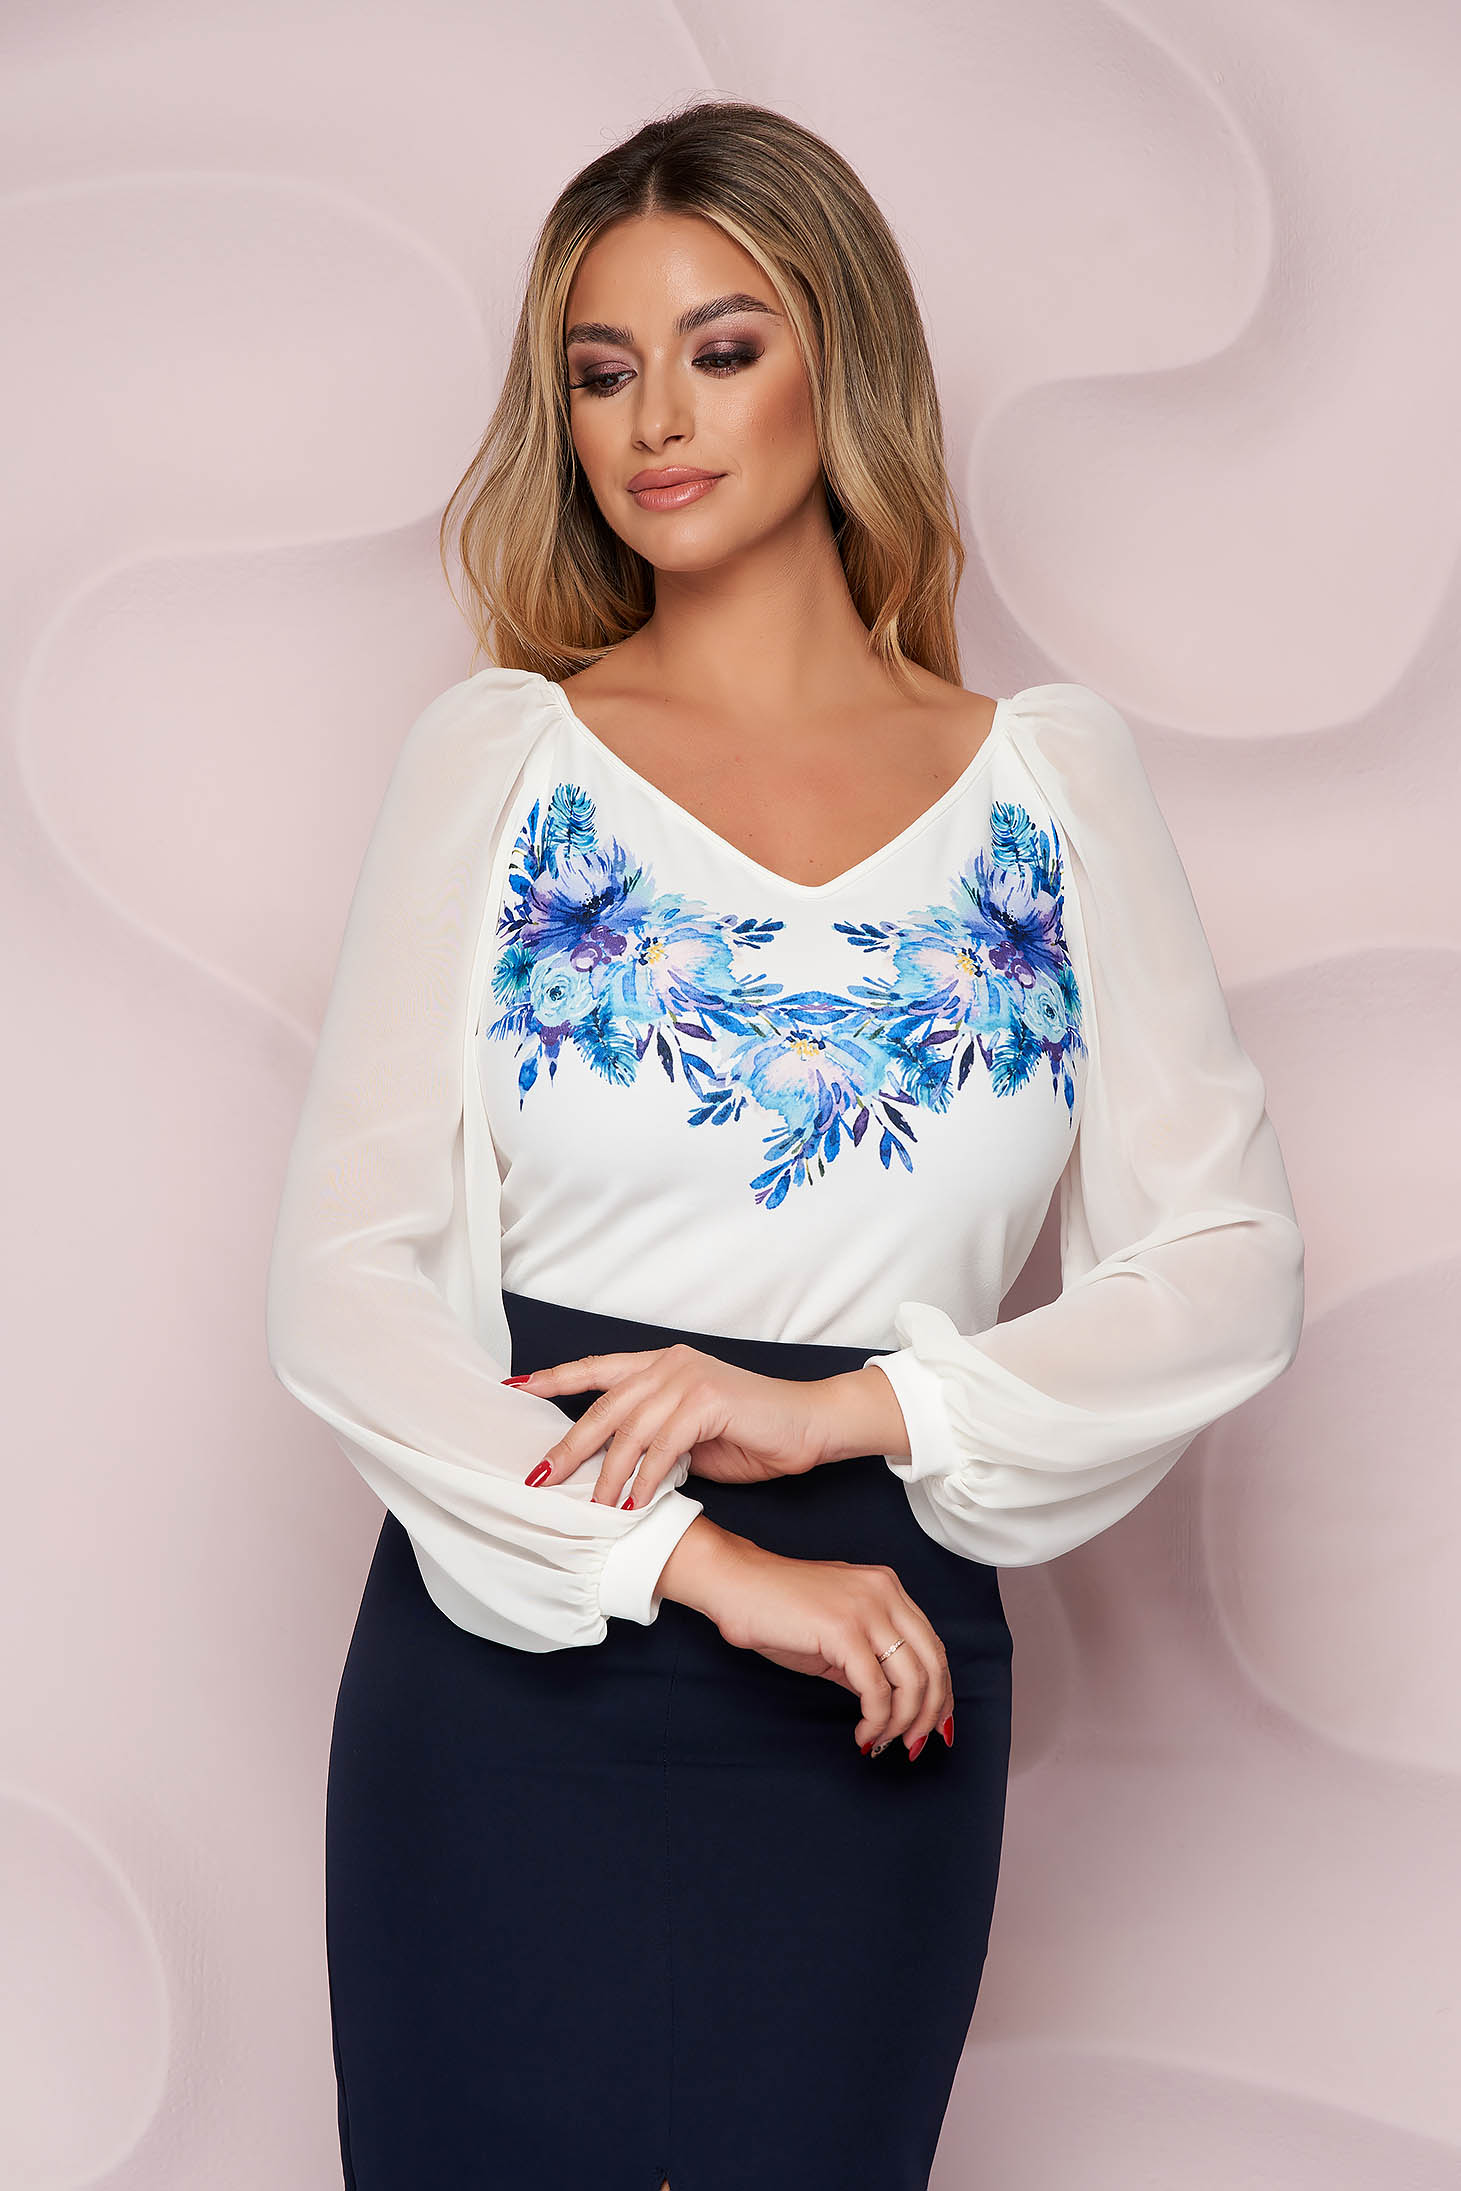 Bluza dama StarShinerS eleganta cu croi larg din material subtire cu maneci lungi si imprimeu floral unic